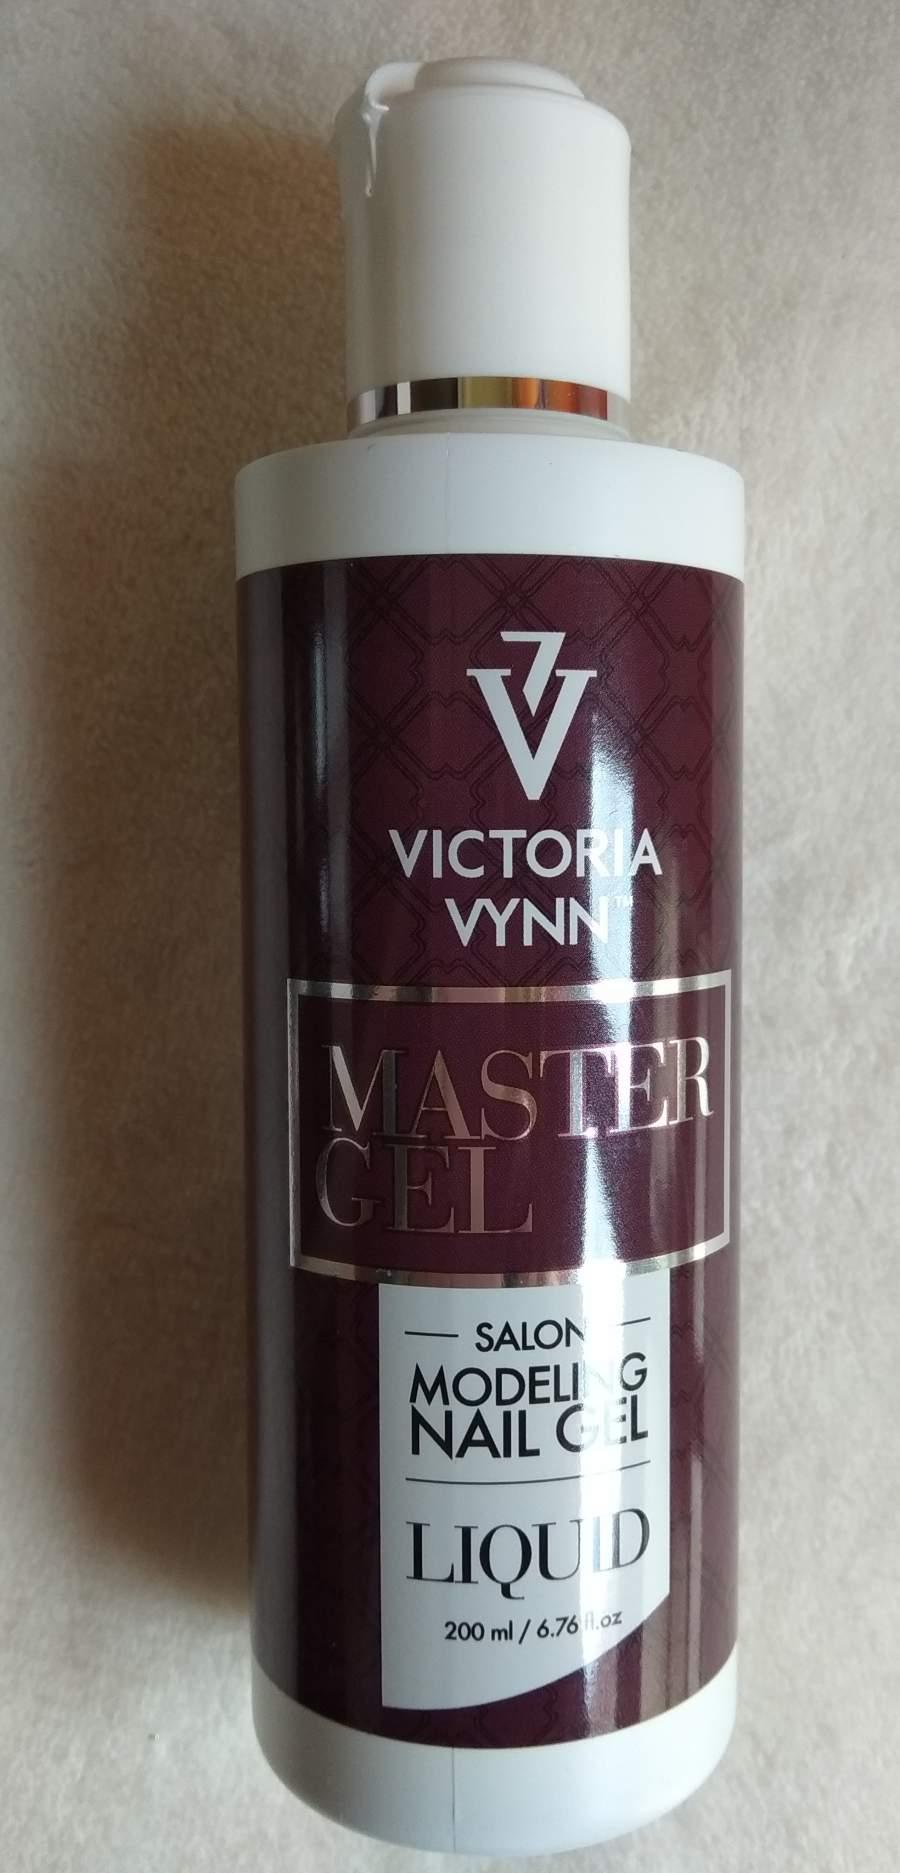 Victoria Vynn - Mastergel - Master Liquid - 200 ml